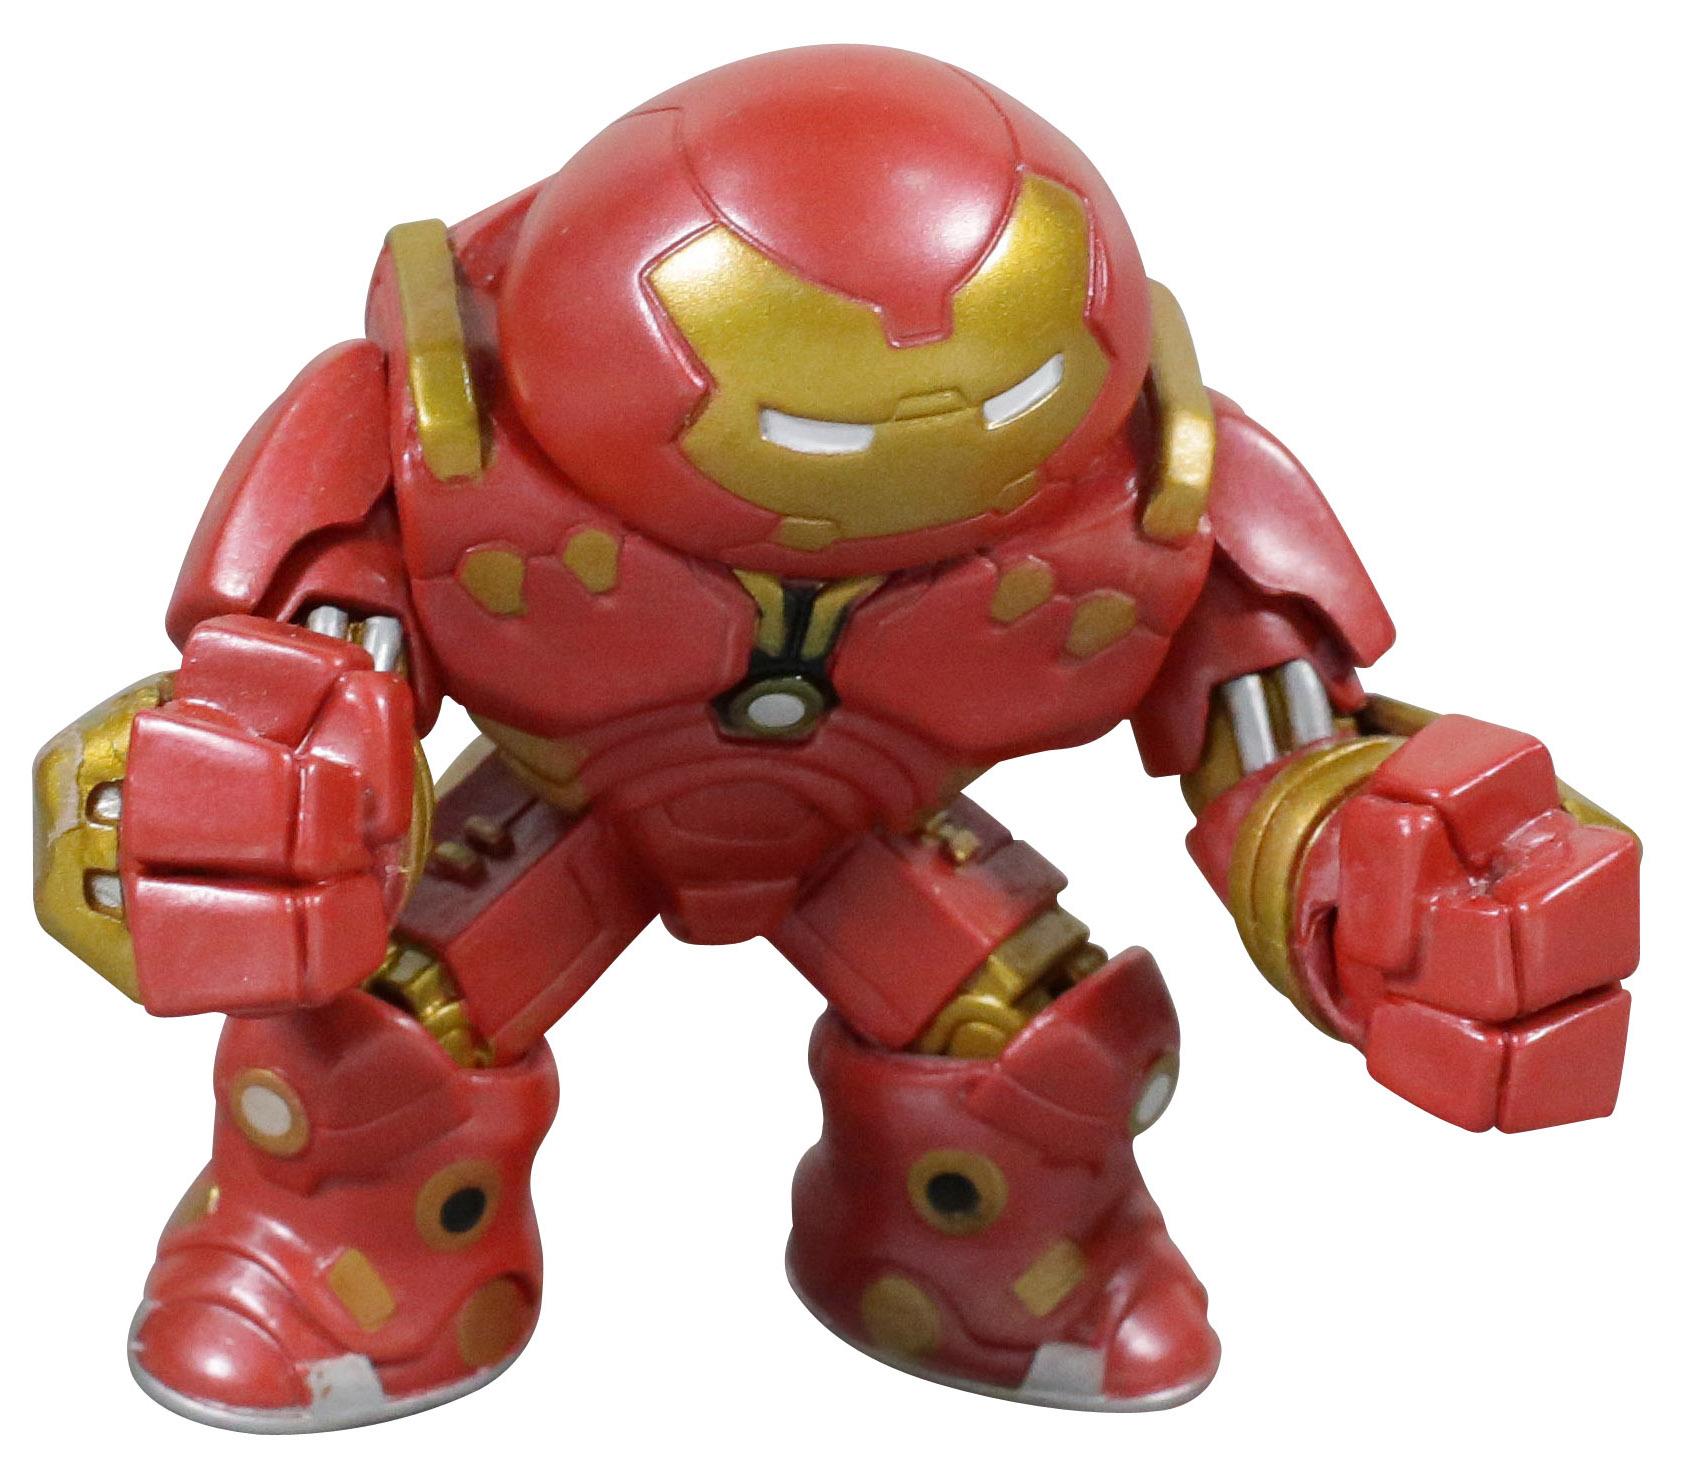 2015 Funko Mystery Minis Avengers Age of Ultron #9 Iron Man Hulkbuster